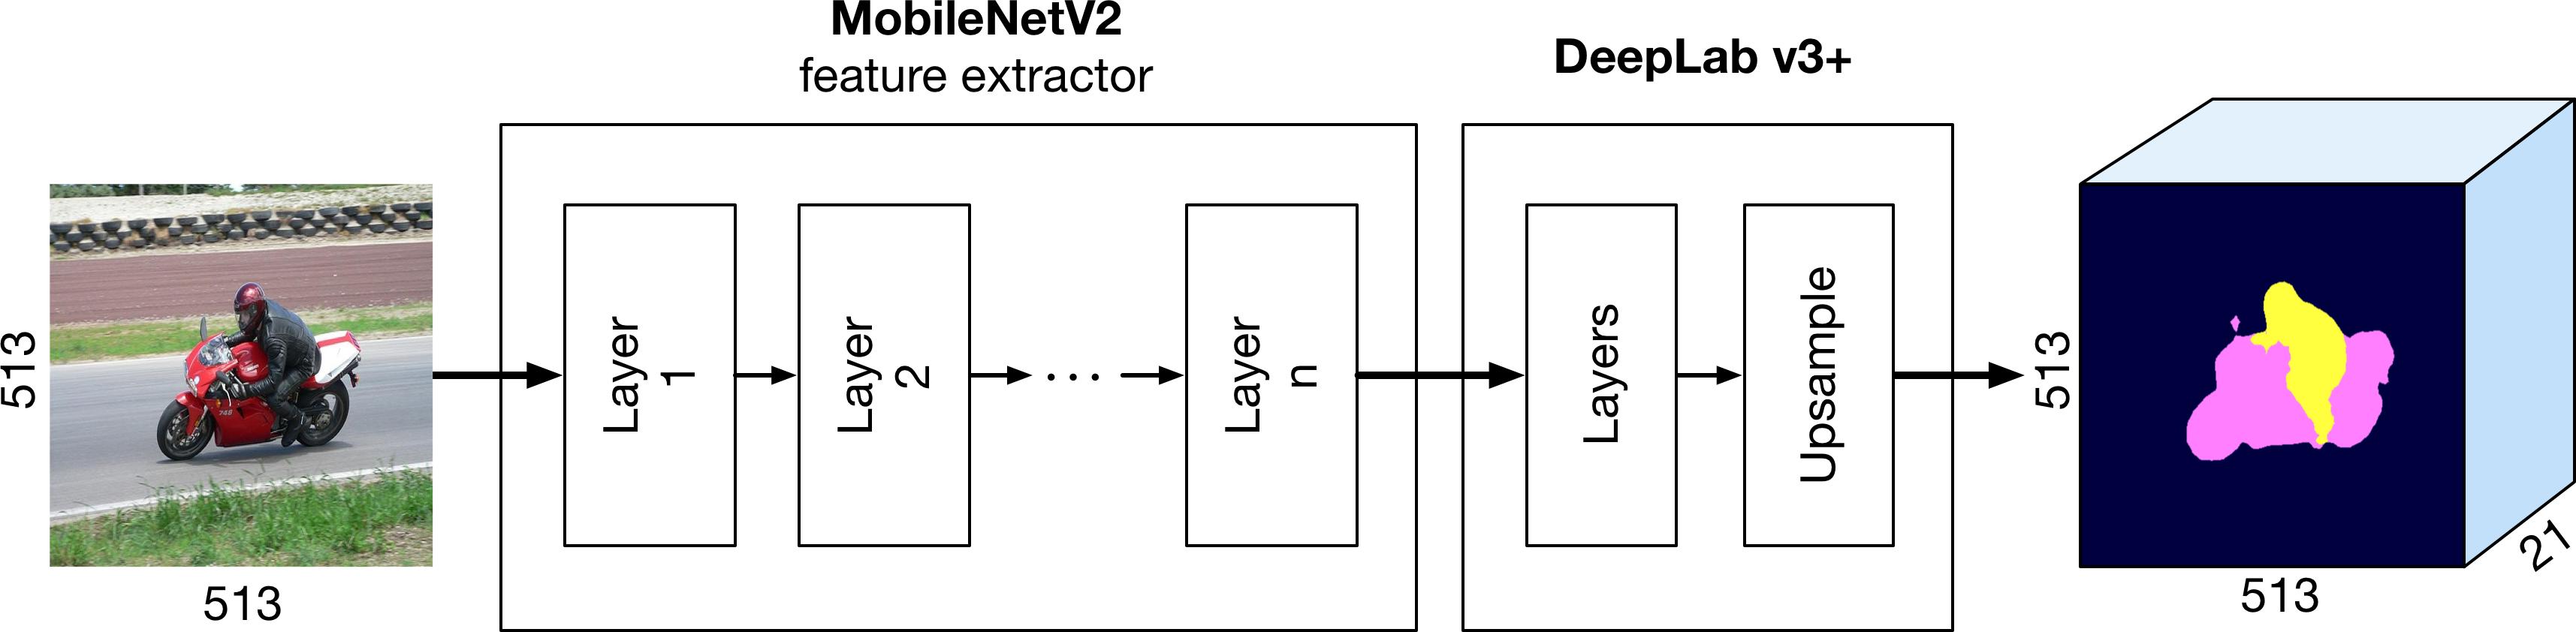 DeepLab on top of MobileNetV2